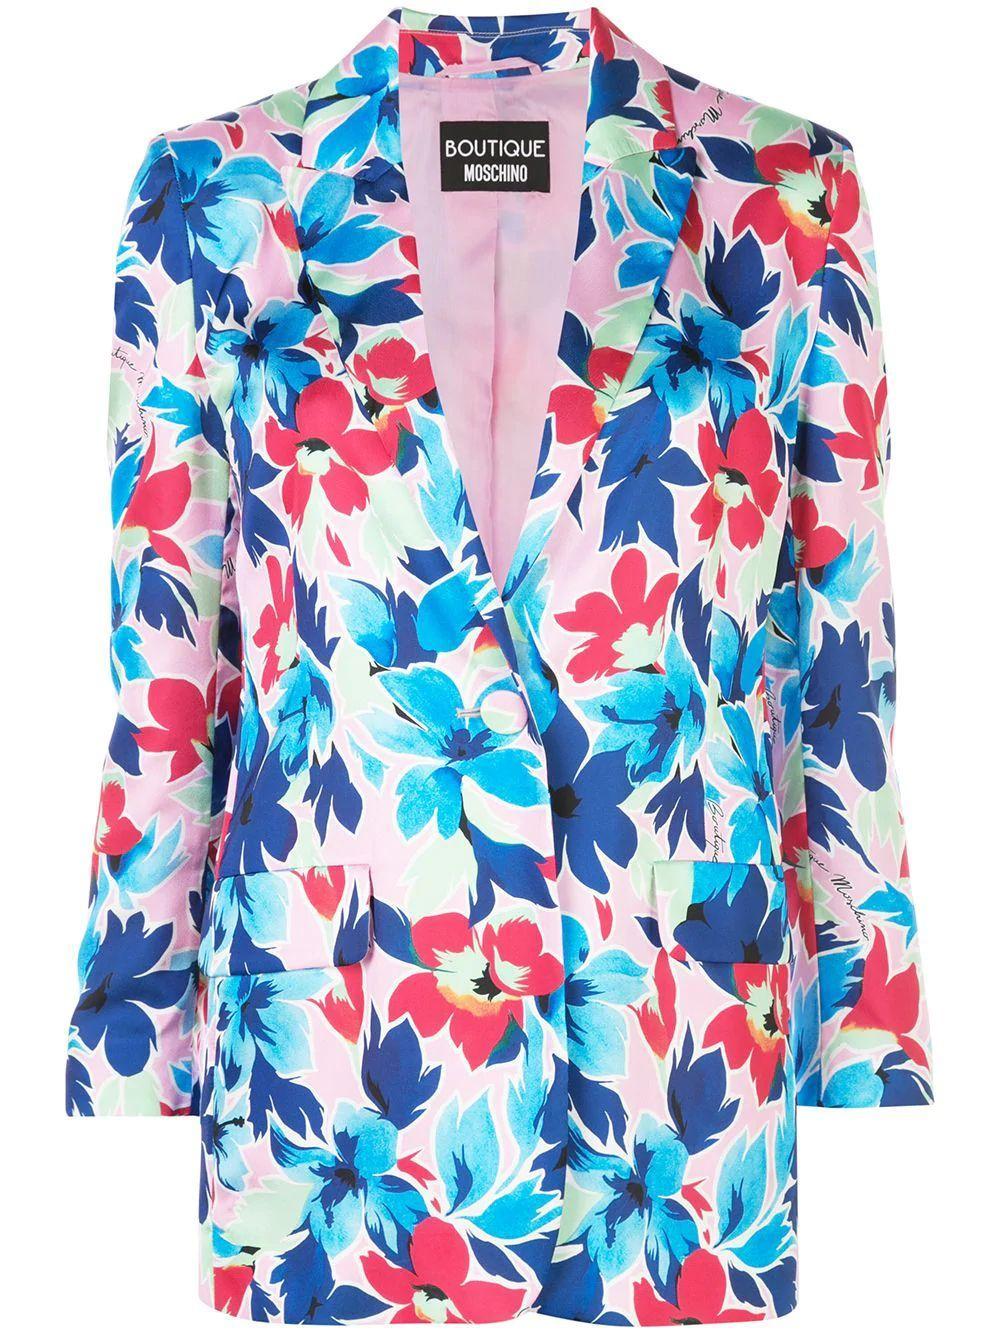 Floral Print Blazer Jacket Item # 0501-1152